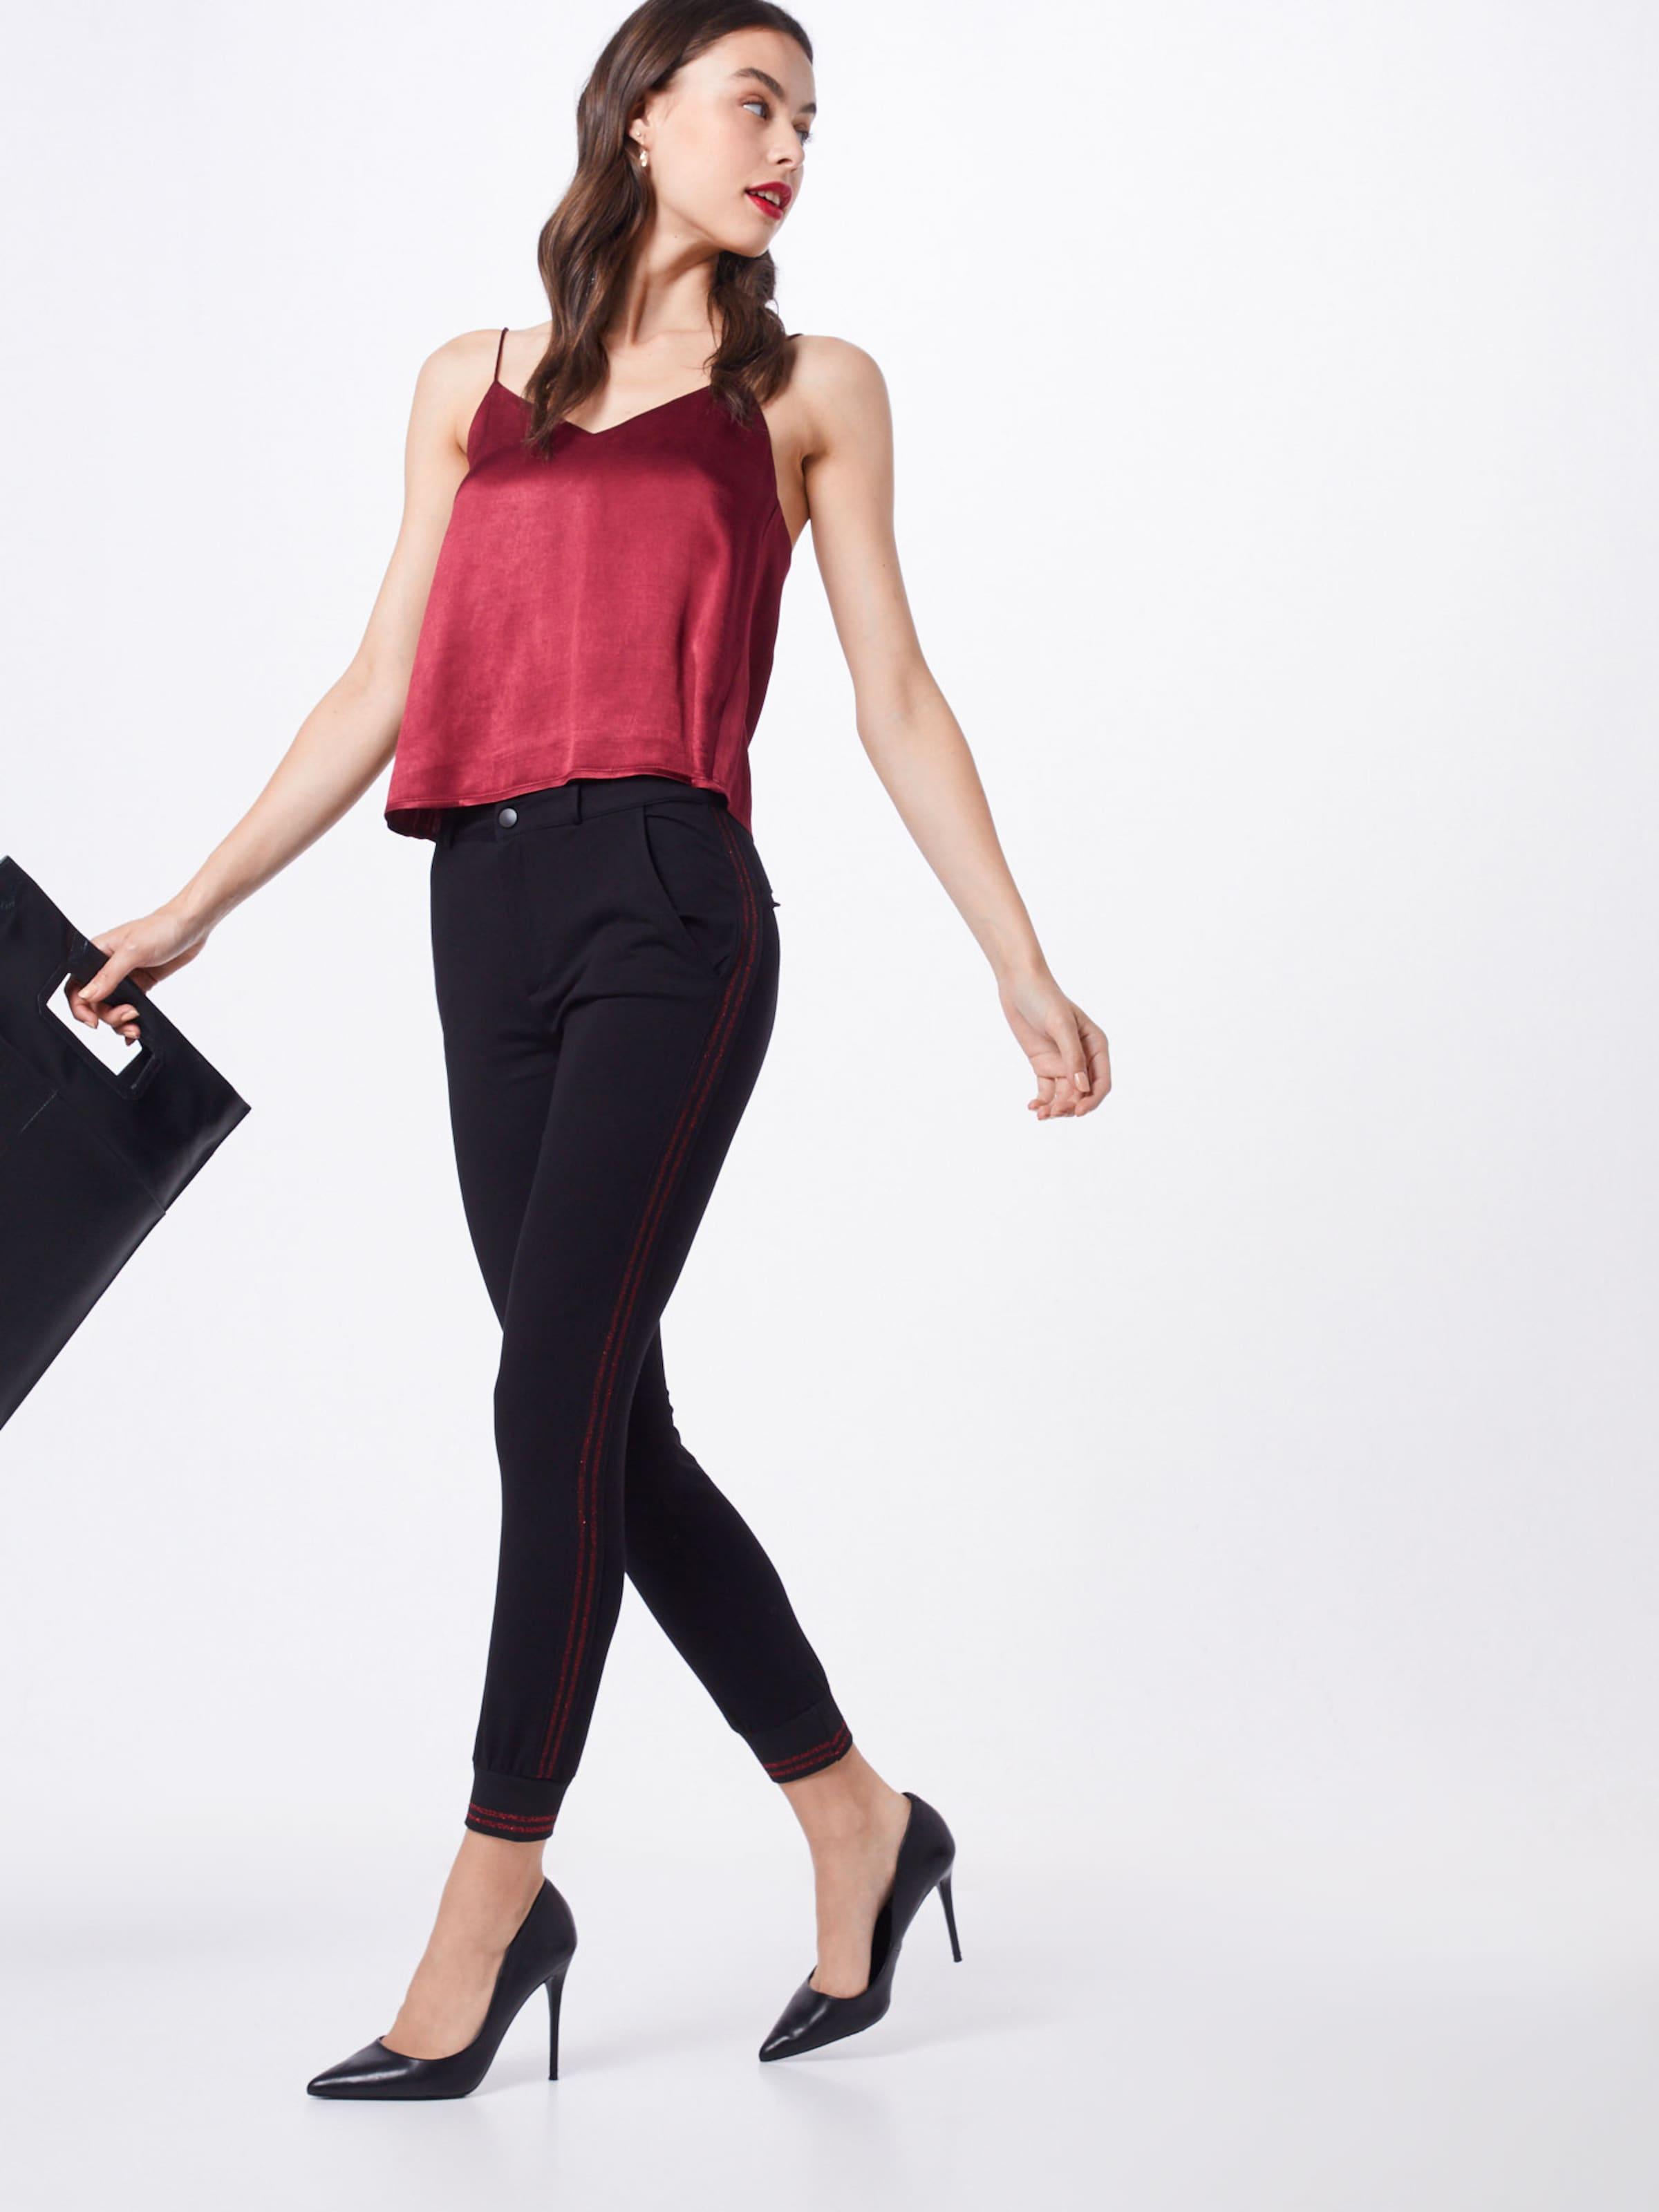 Pantalon Goodlife En Miss Miss Miss Noir Noir Goodlife Goodlife Pantalon En 2YH9EDWeIb